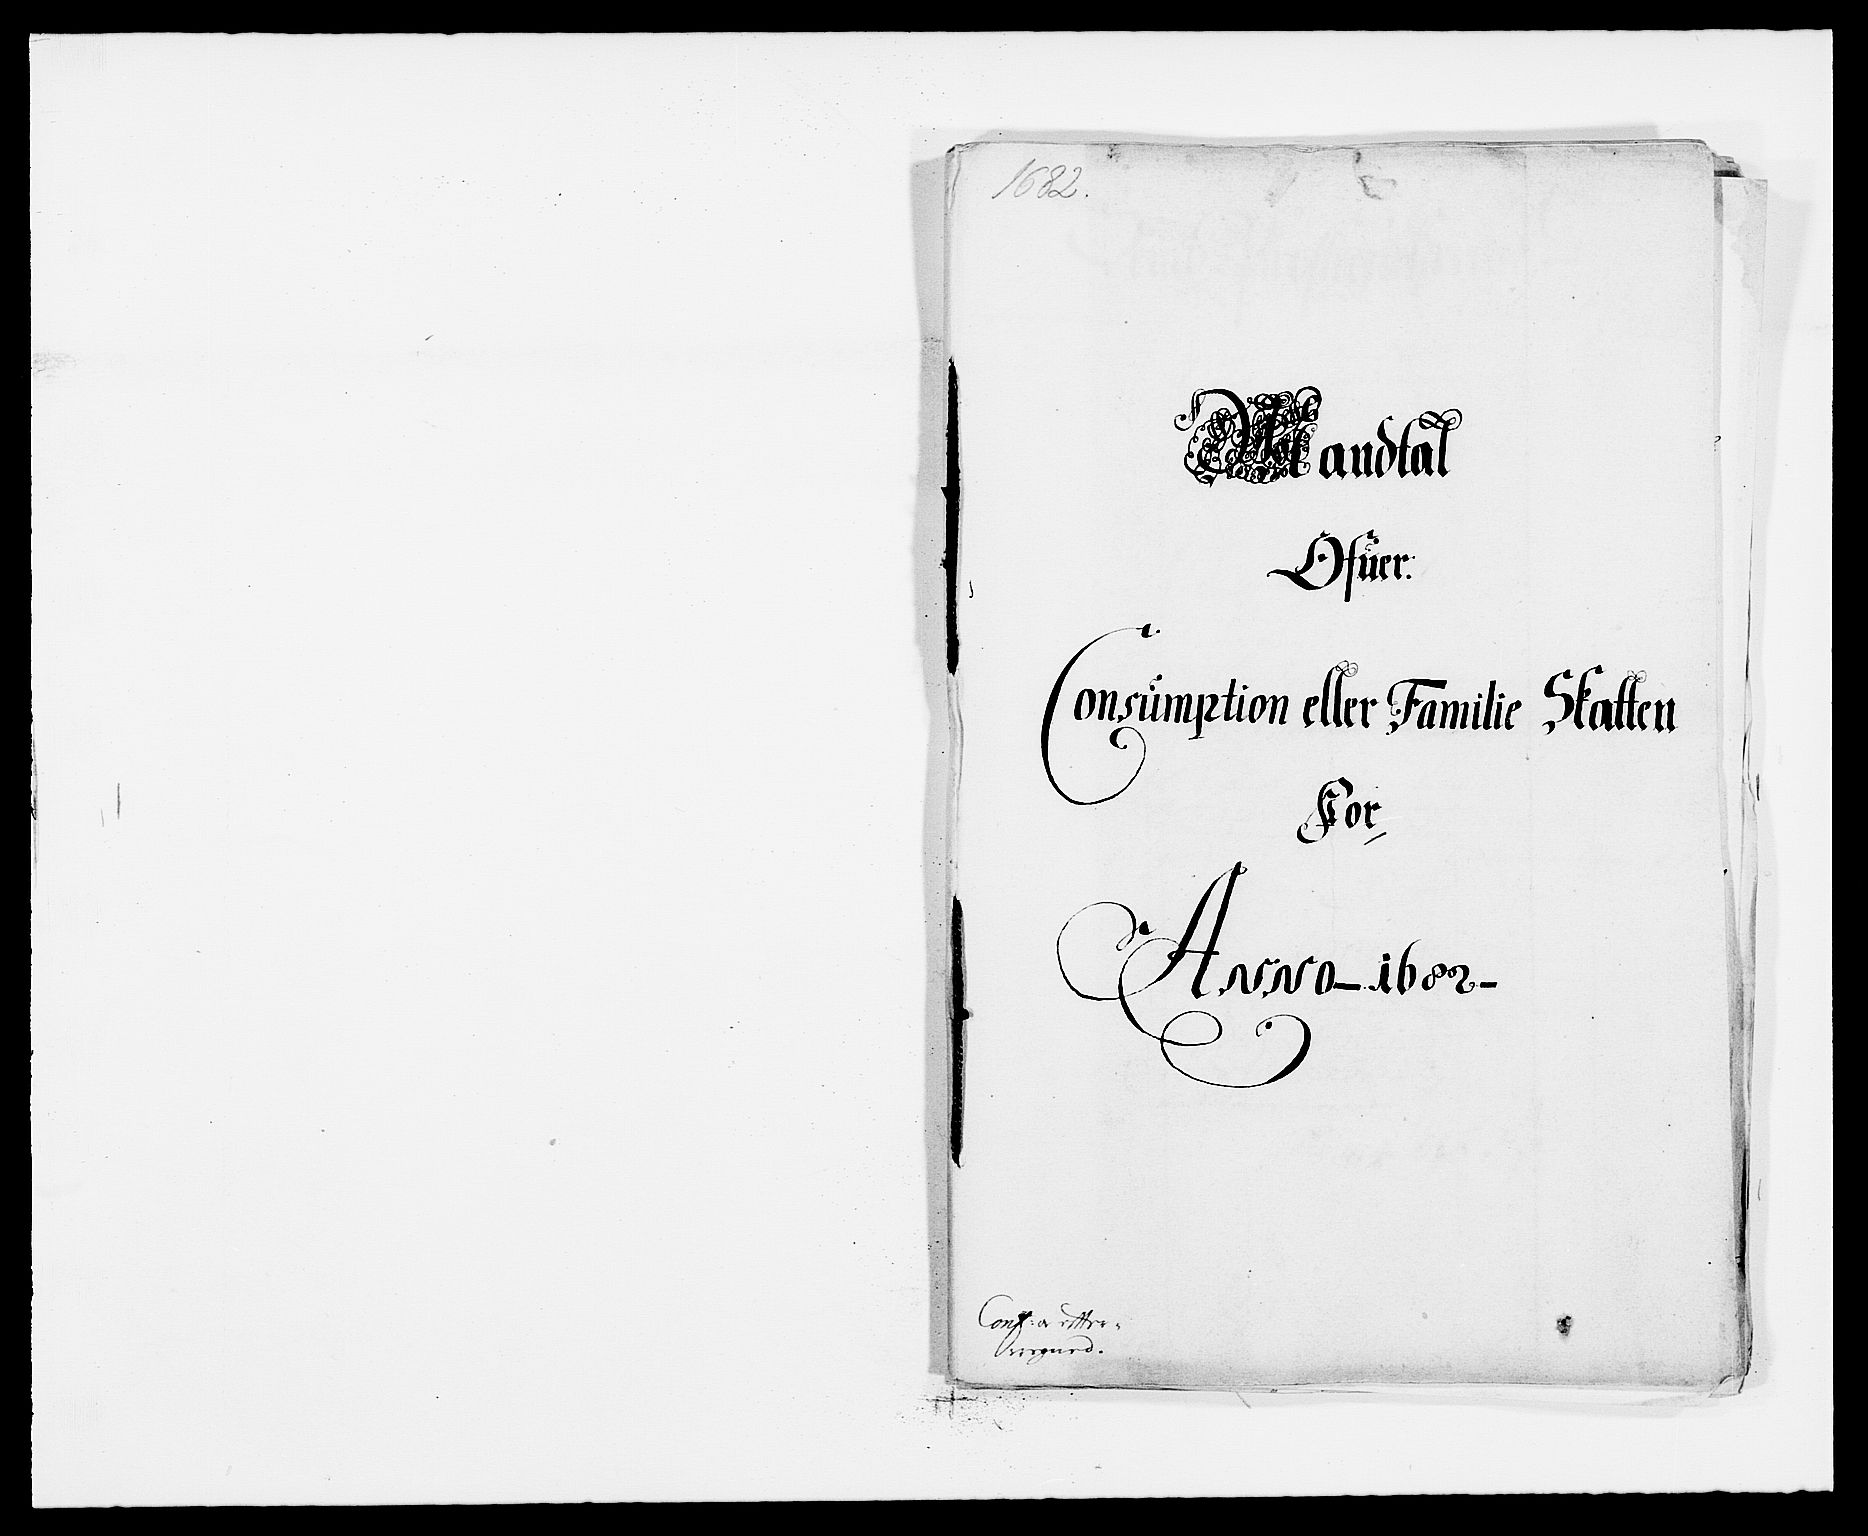 RA, Rentekammeret inntil 1814, Reviderte regnskaper, Fogderegnskap, R32/L1851: Fogderegnskap Jarlsberg grevskap, 1682, s. 283